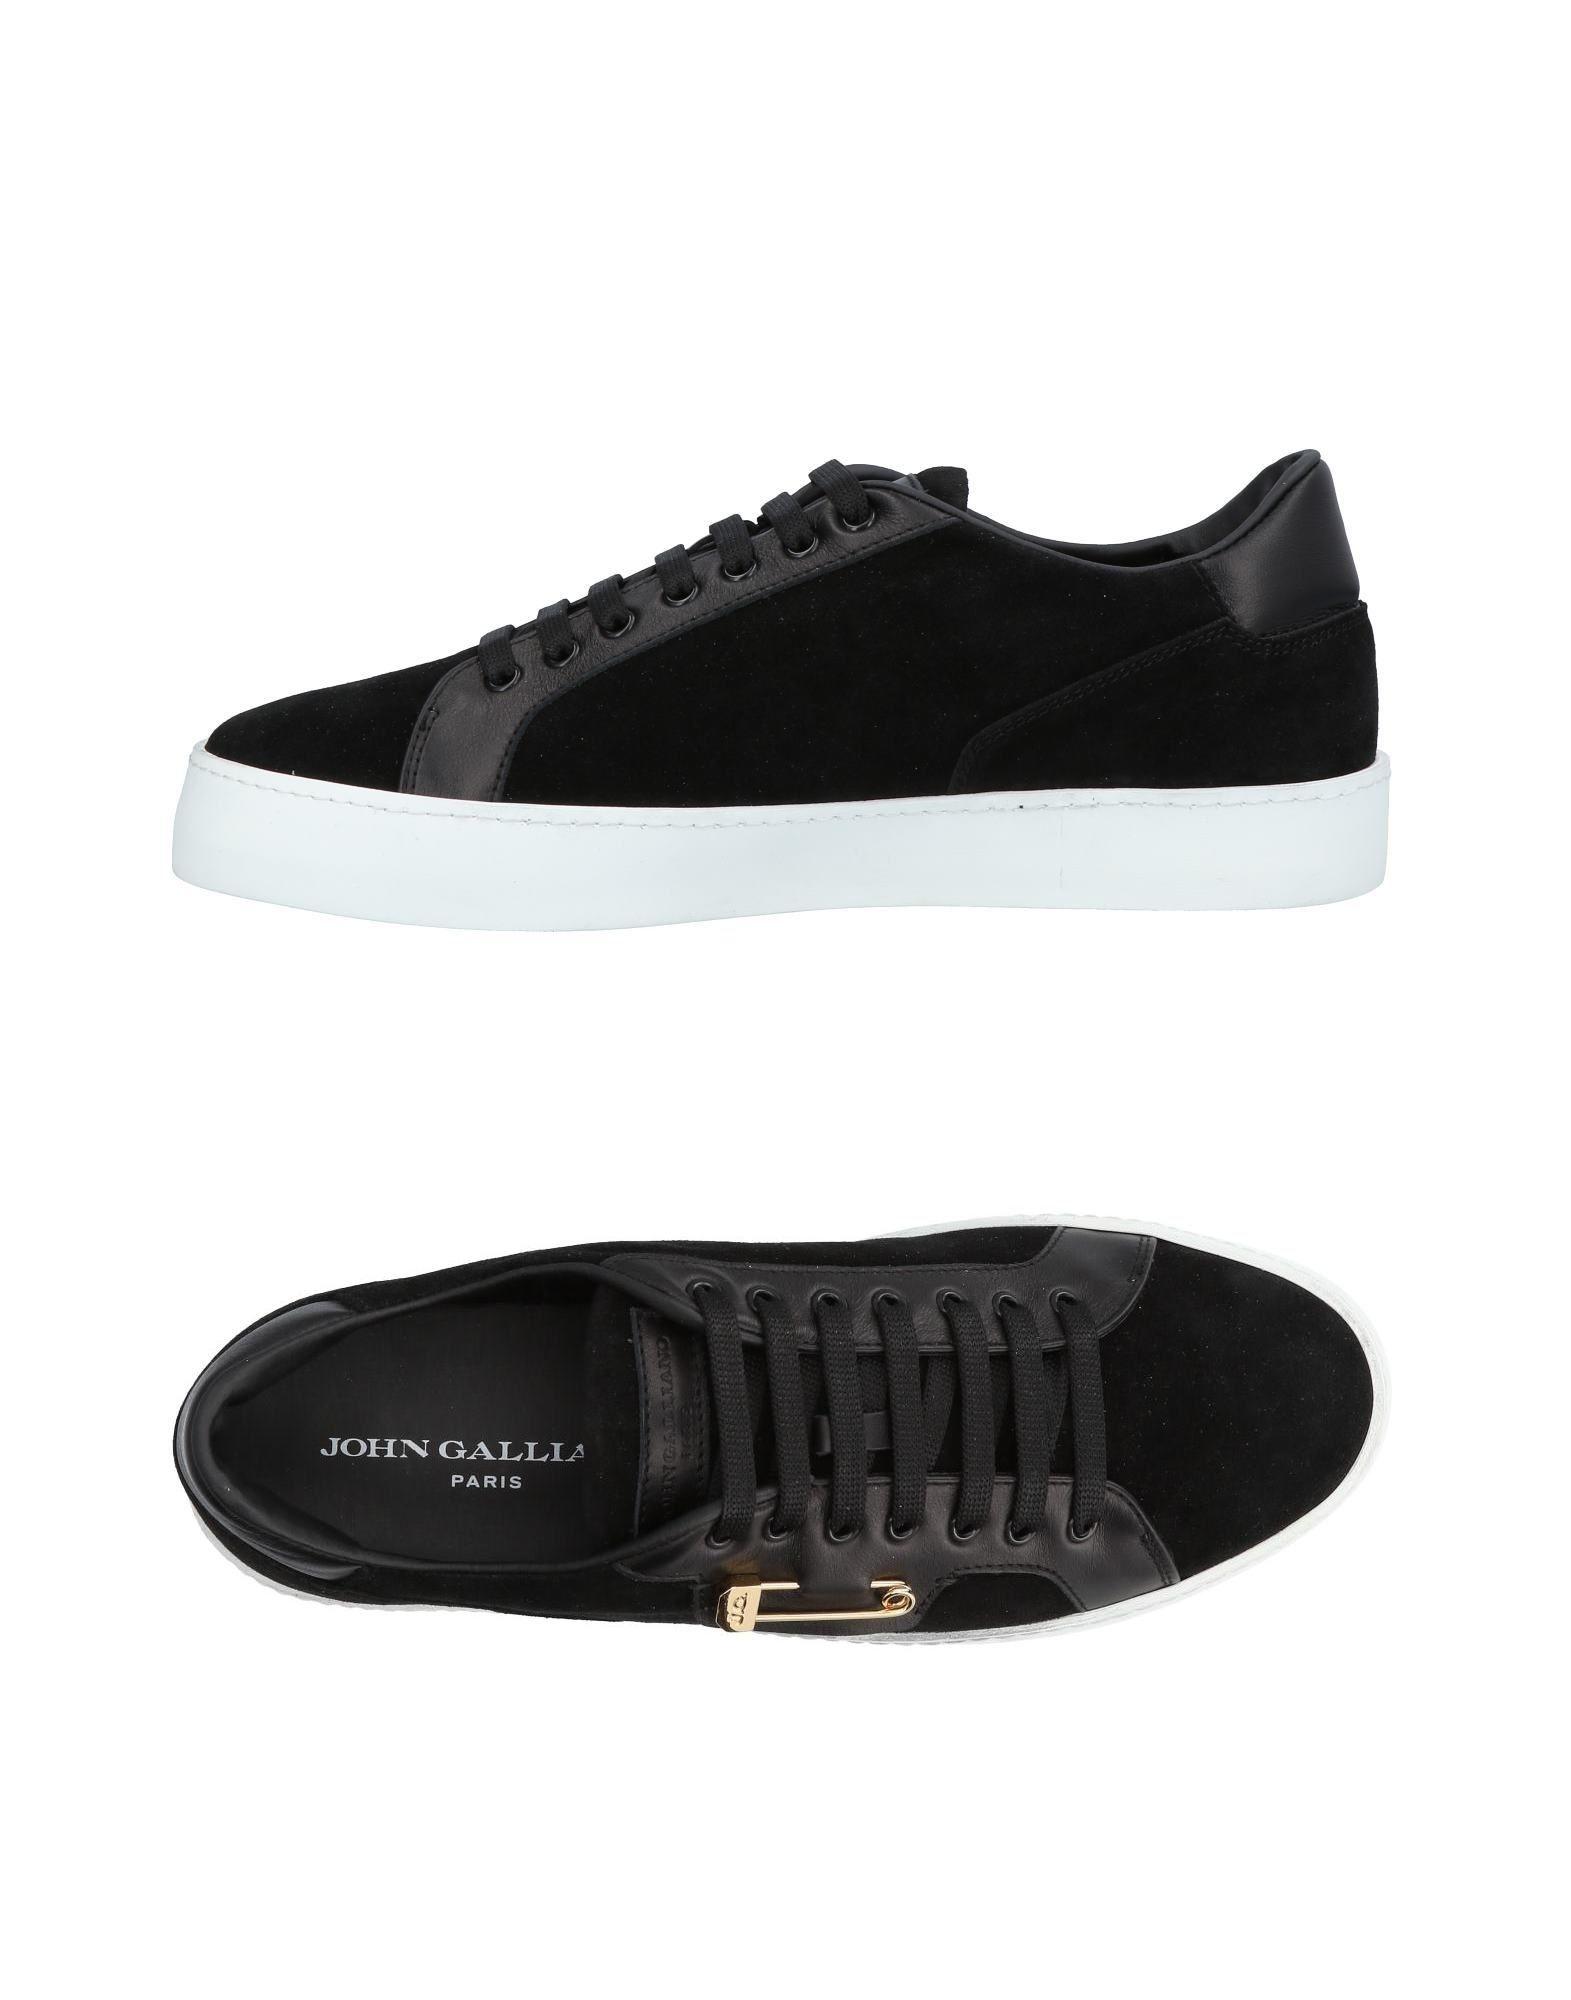 d9146153588 JOHN GALLIANO ΠΑΠΟΥΤΣΙΑ Παπούτσια τένις χαμηλά, Ανδρικά παπούτσια ...